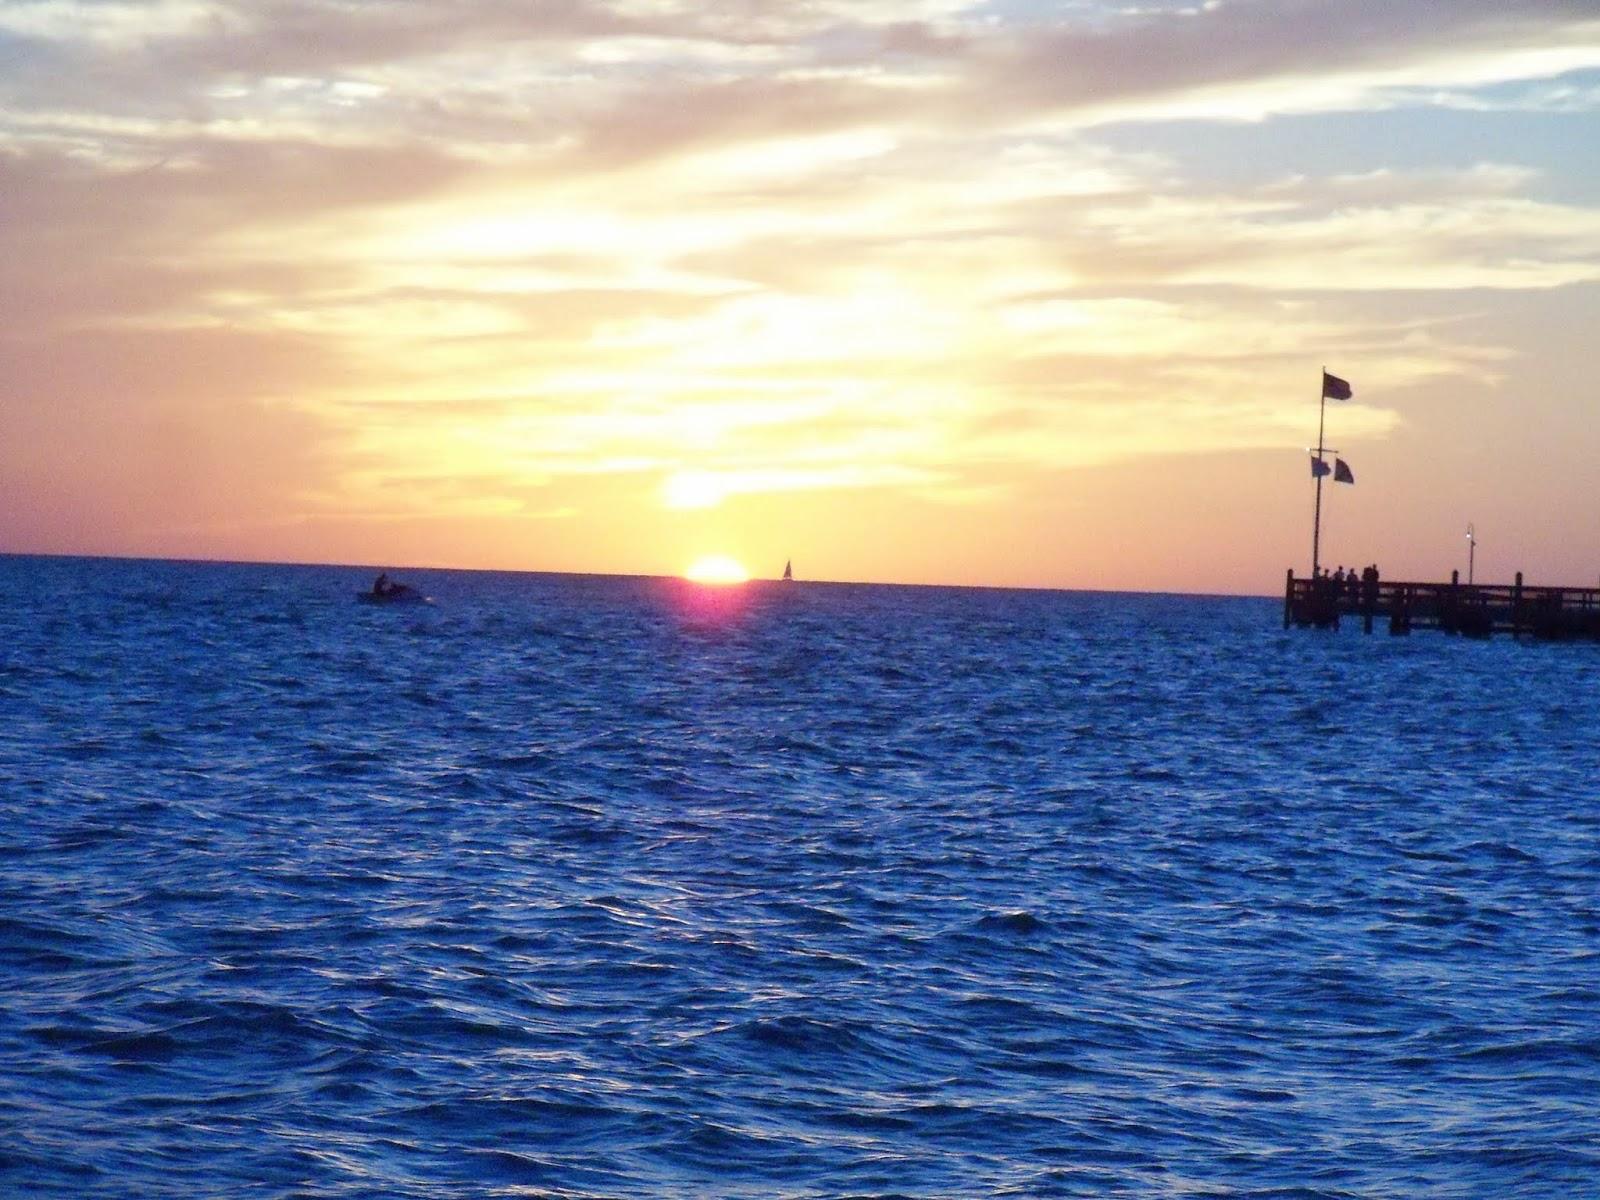 Key West Vacation - 116_5608.JPG